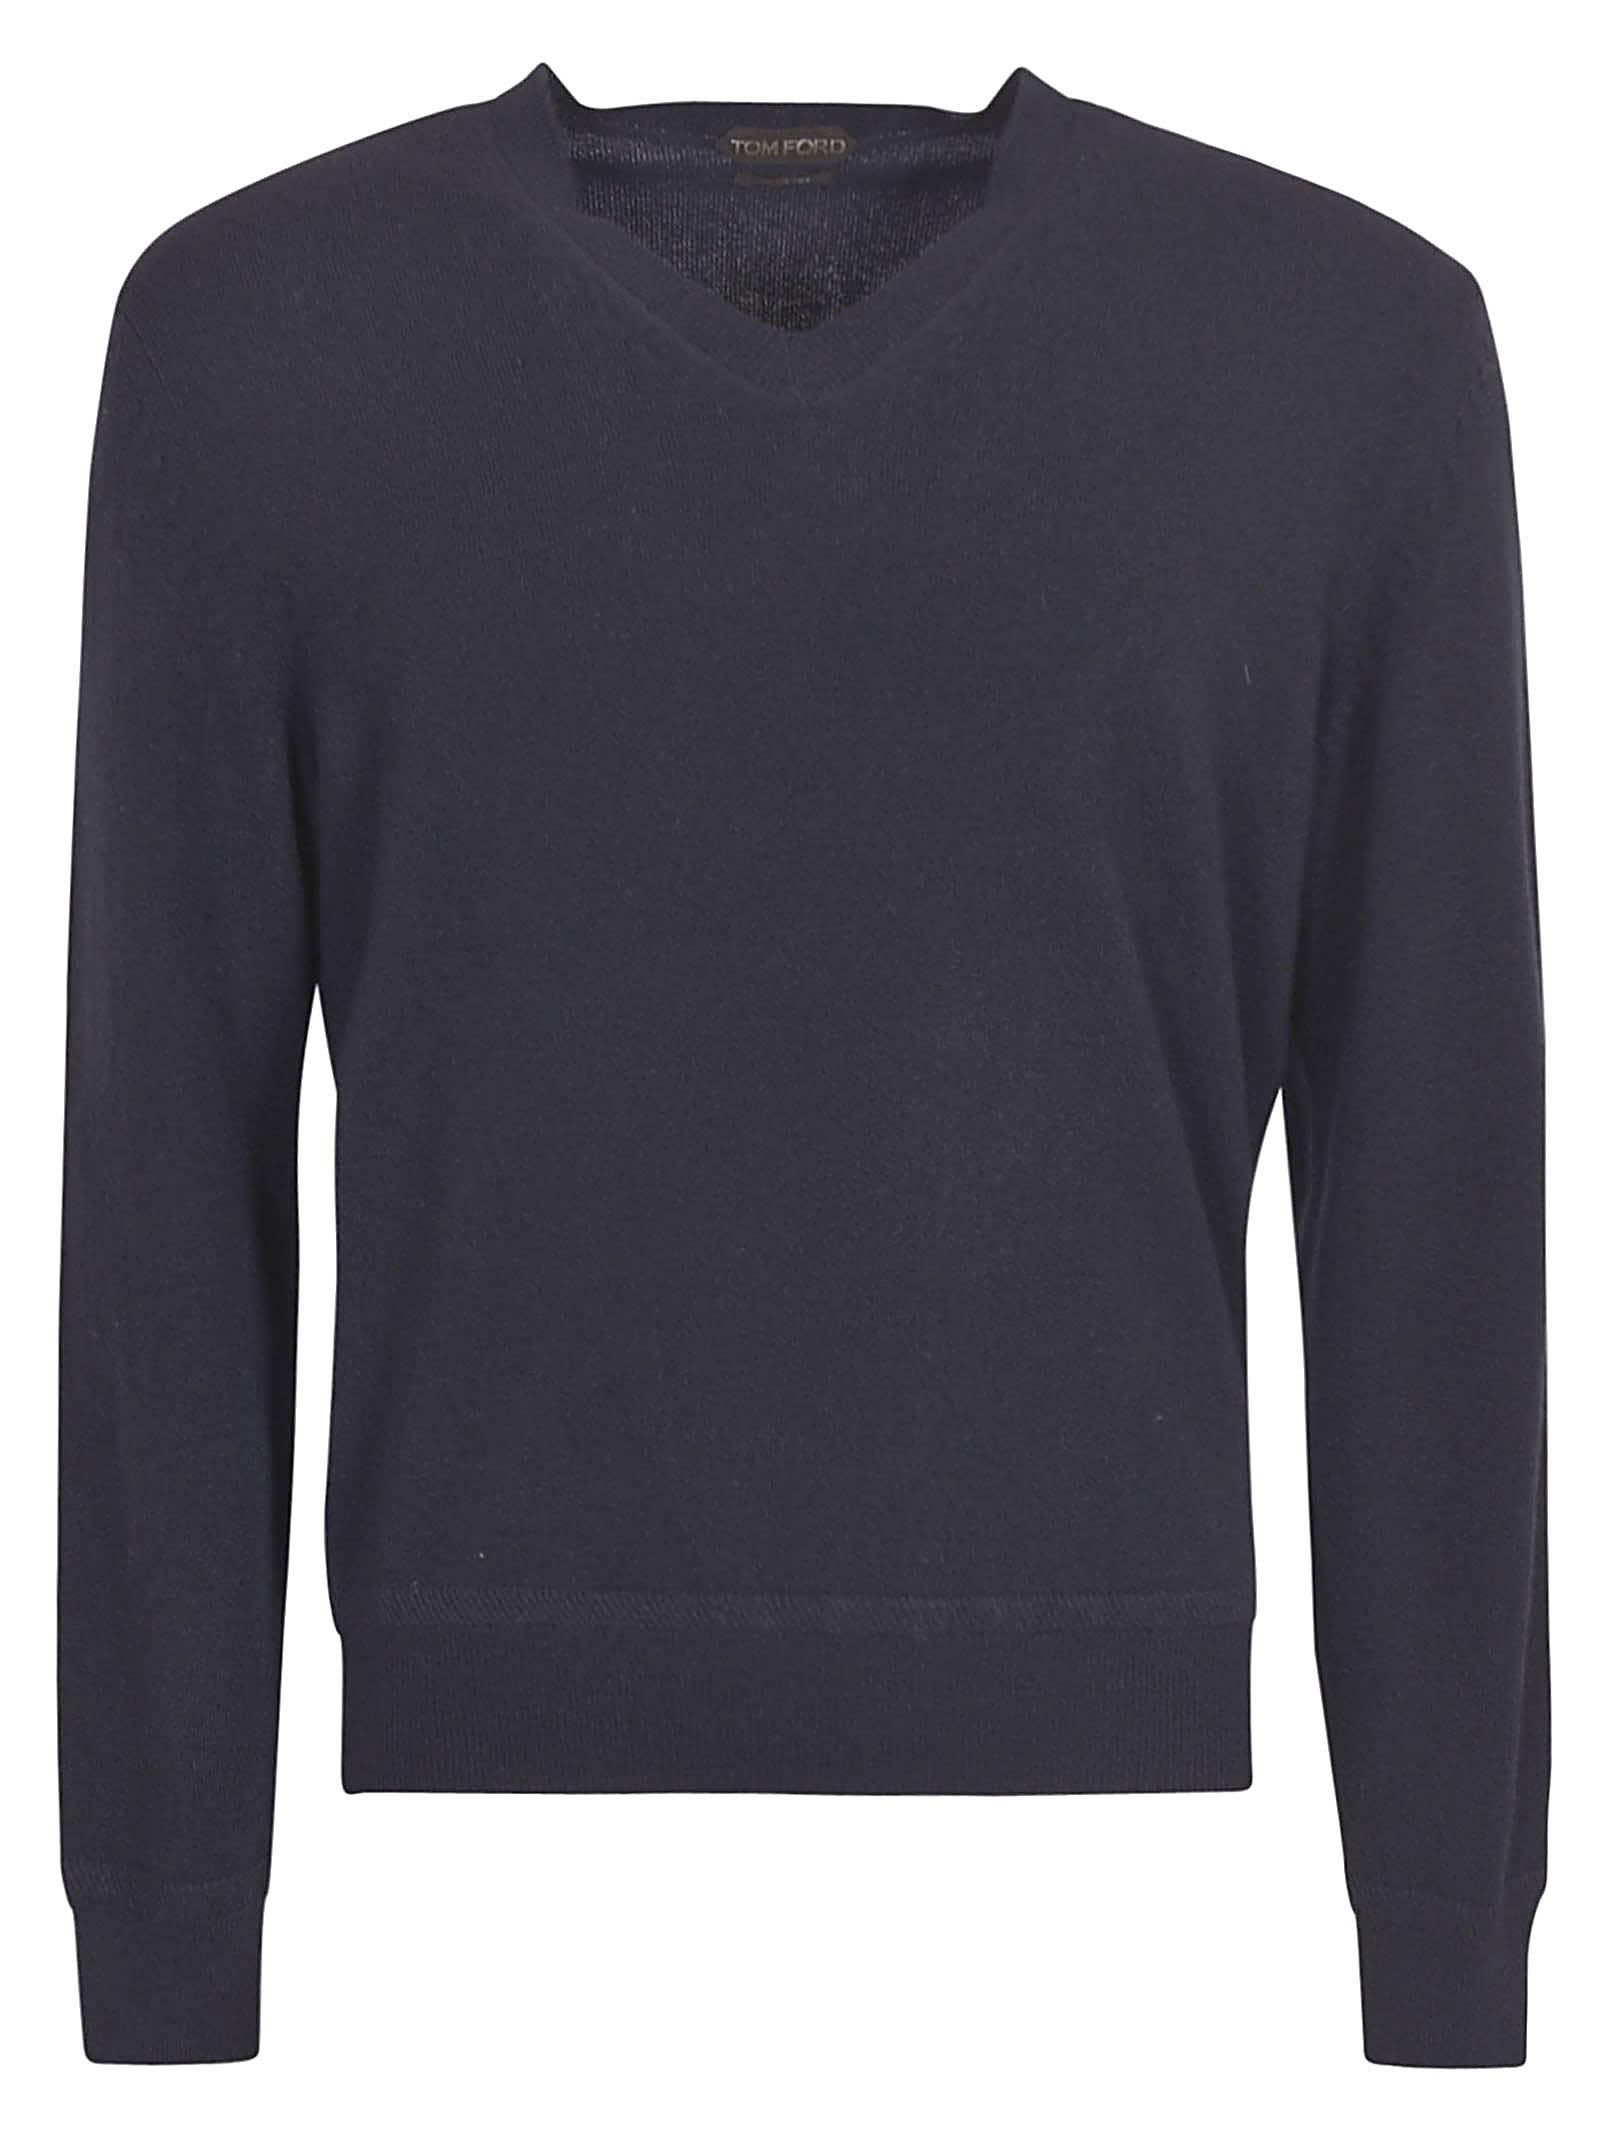 Tom Ford V-neck Sweater In Blue